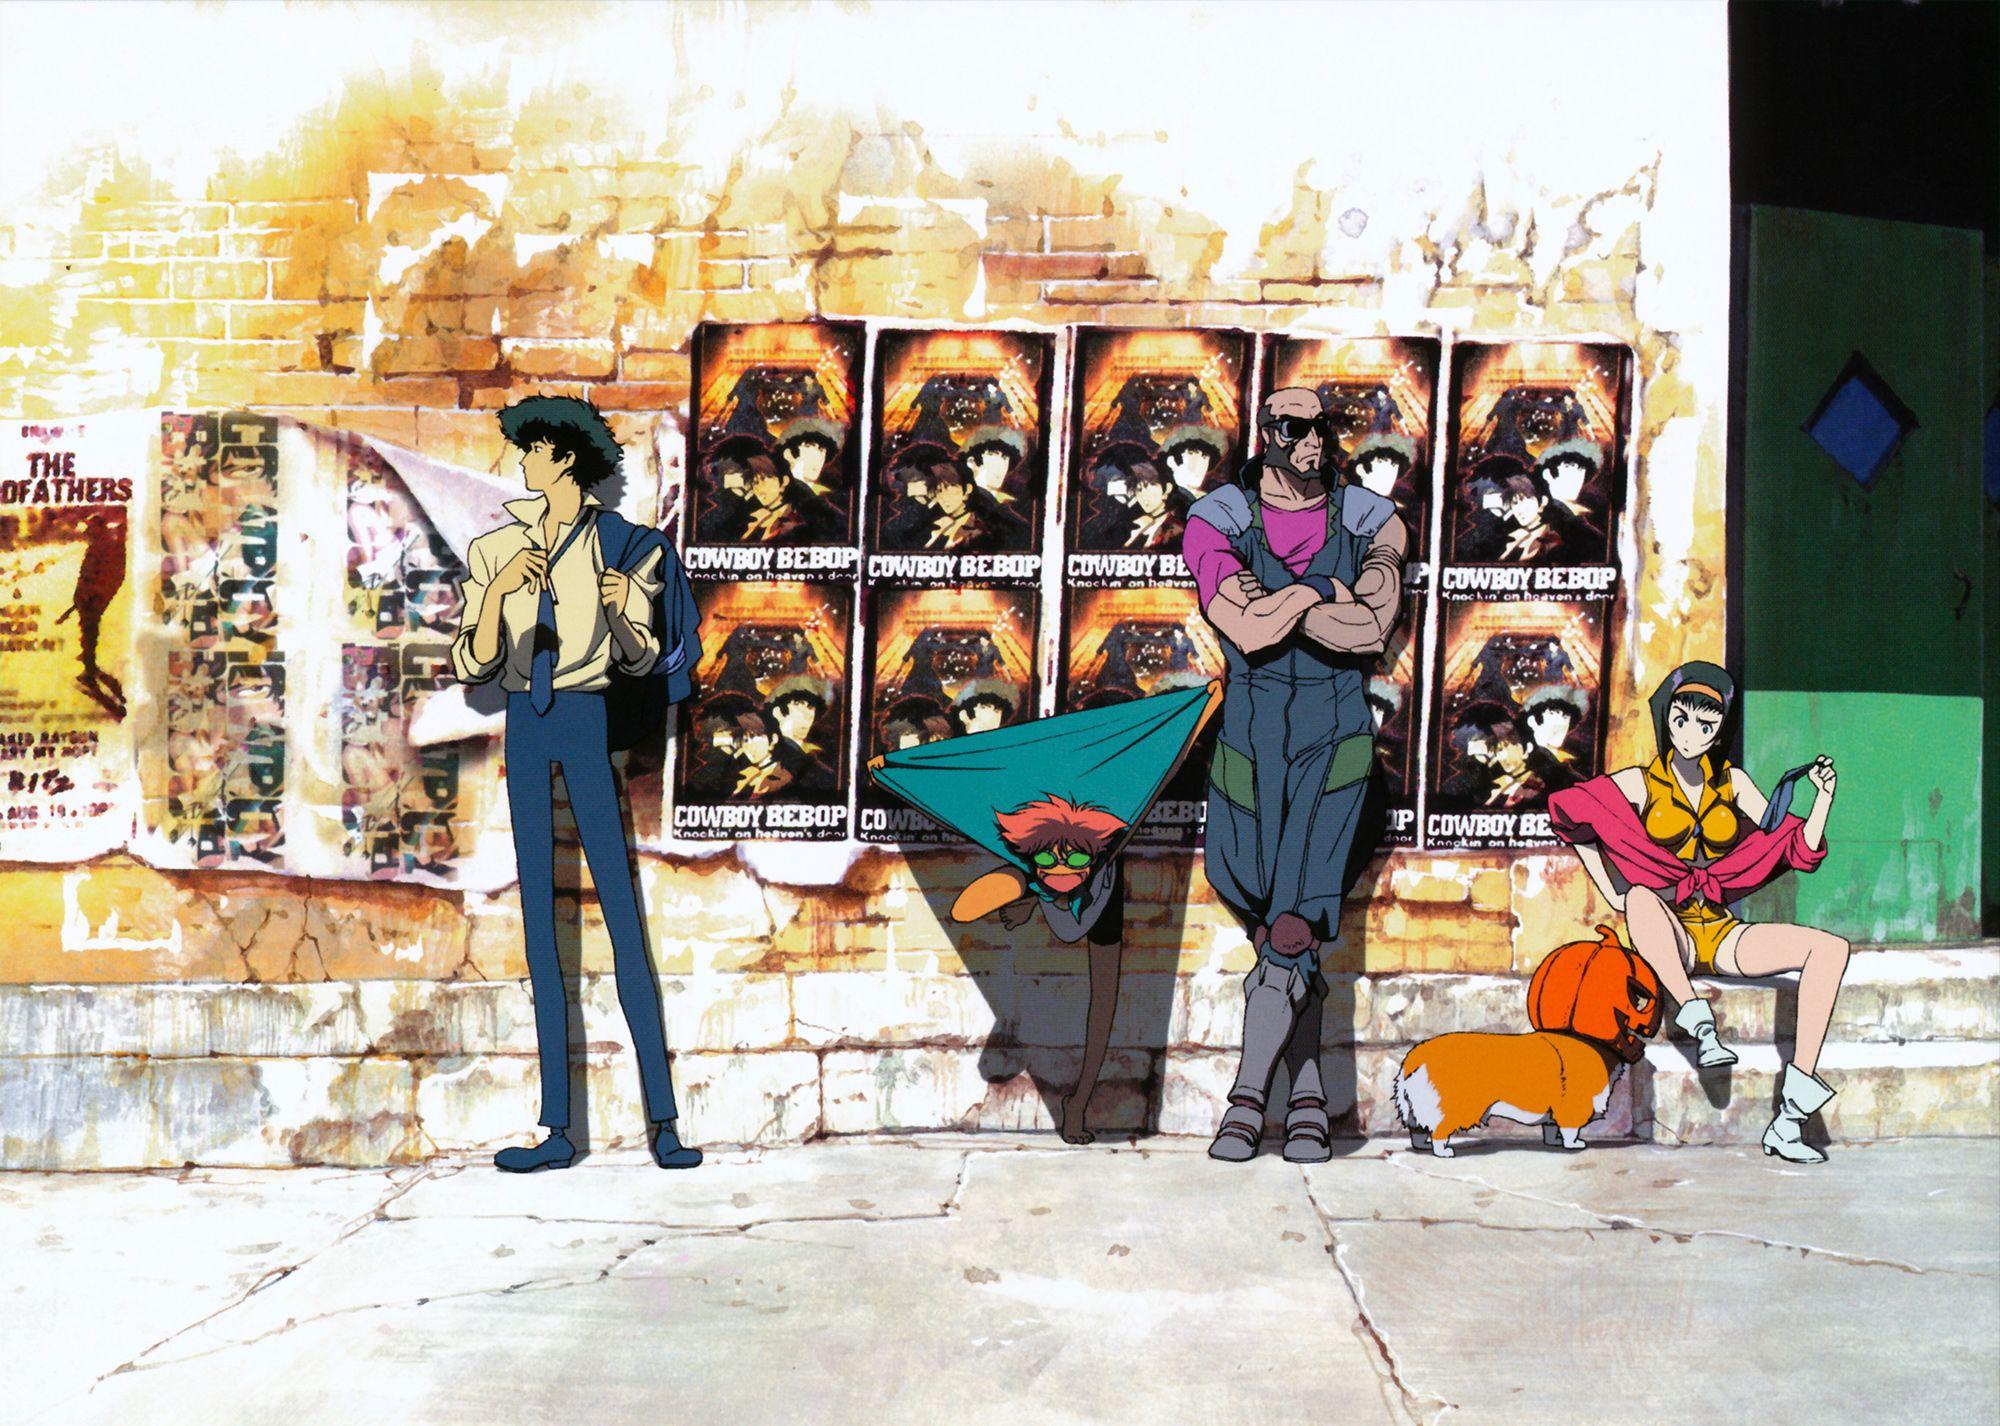 Cowboy bebop anime visual 1